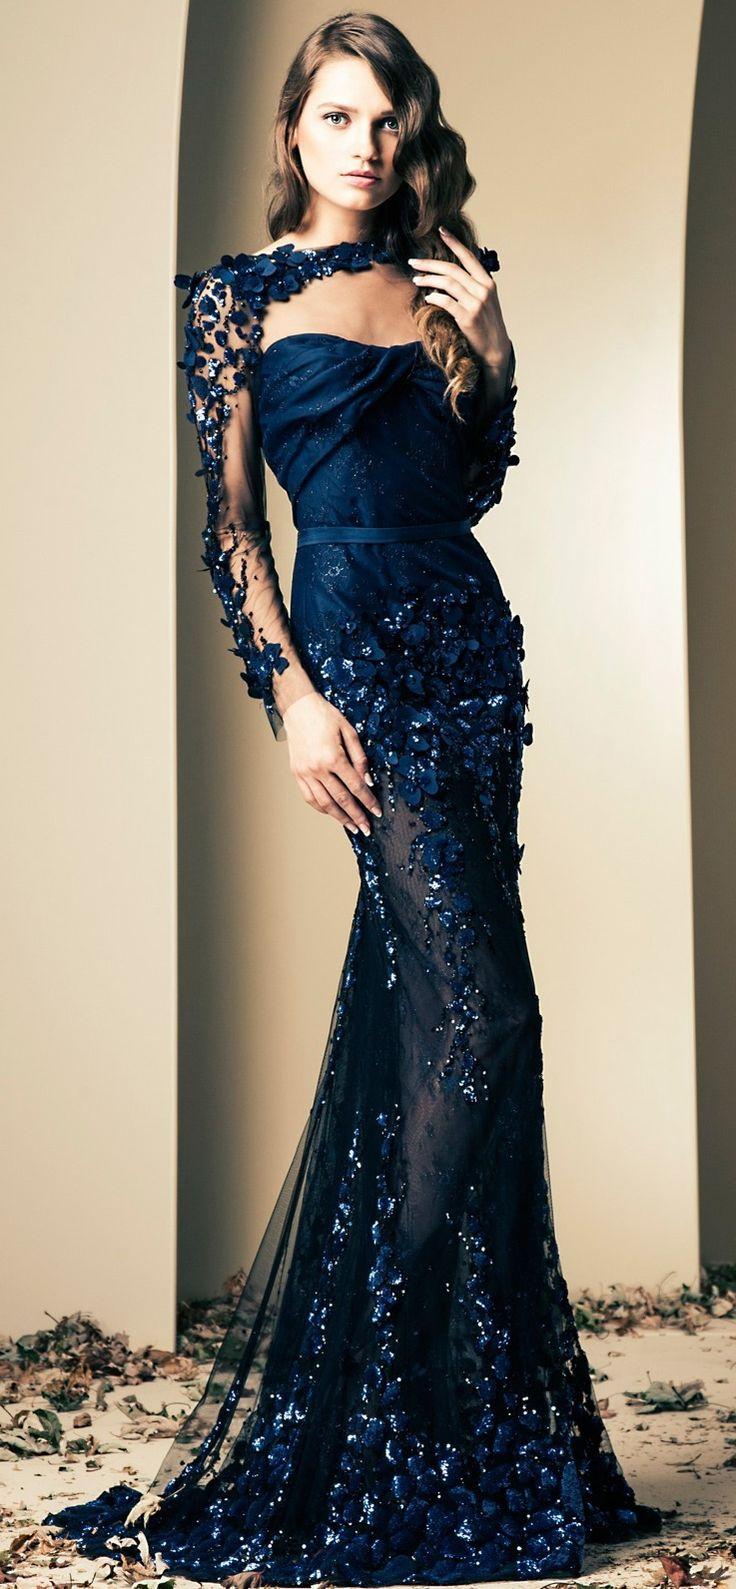 best designer gowns images on pinterest dream dress high